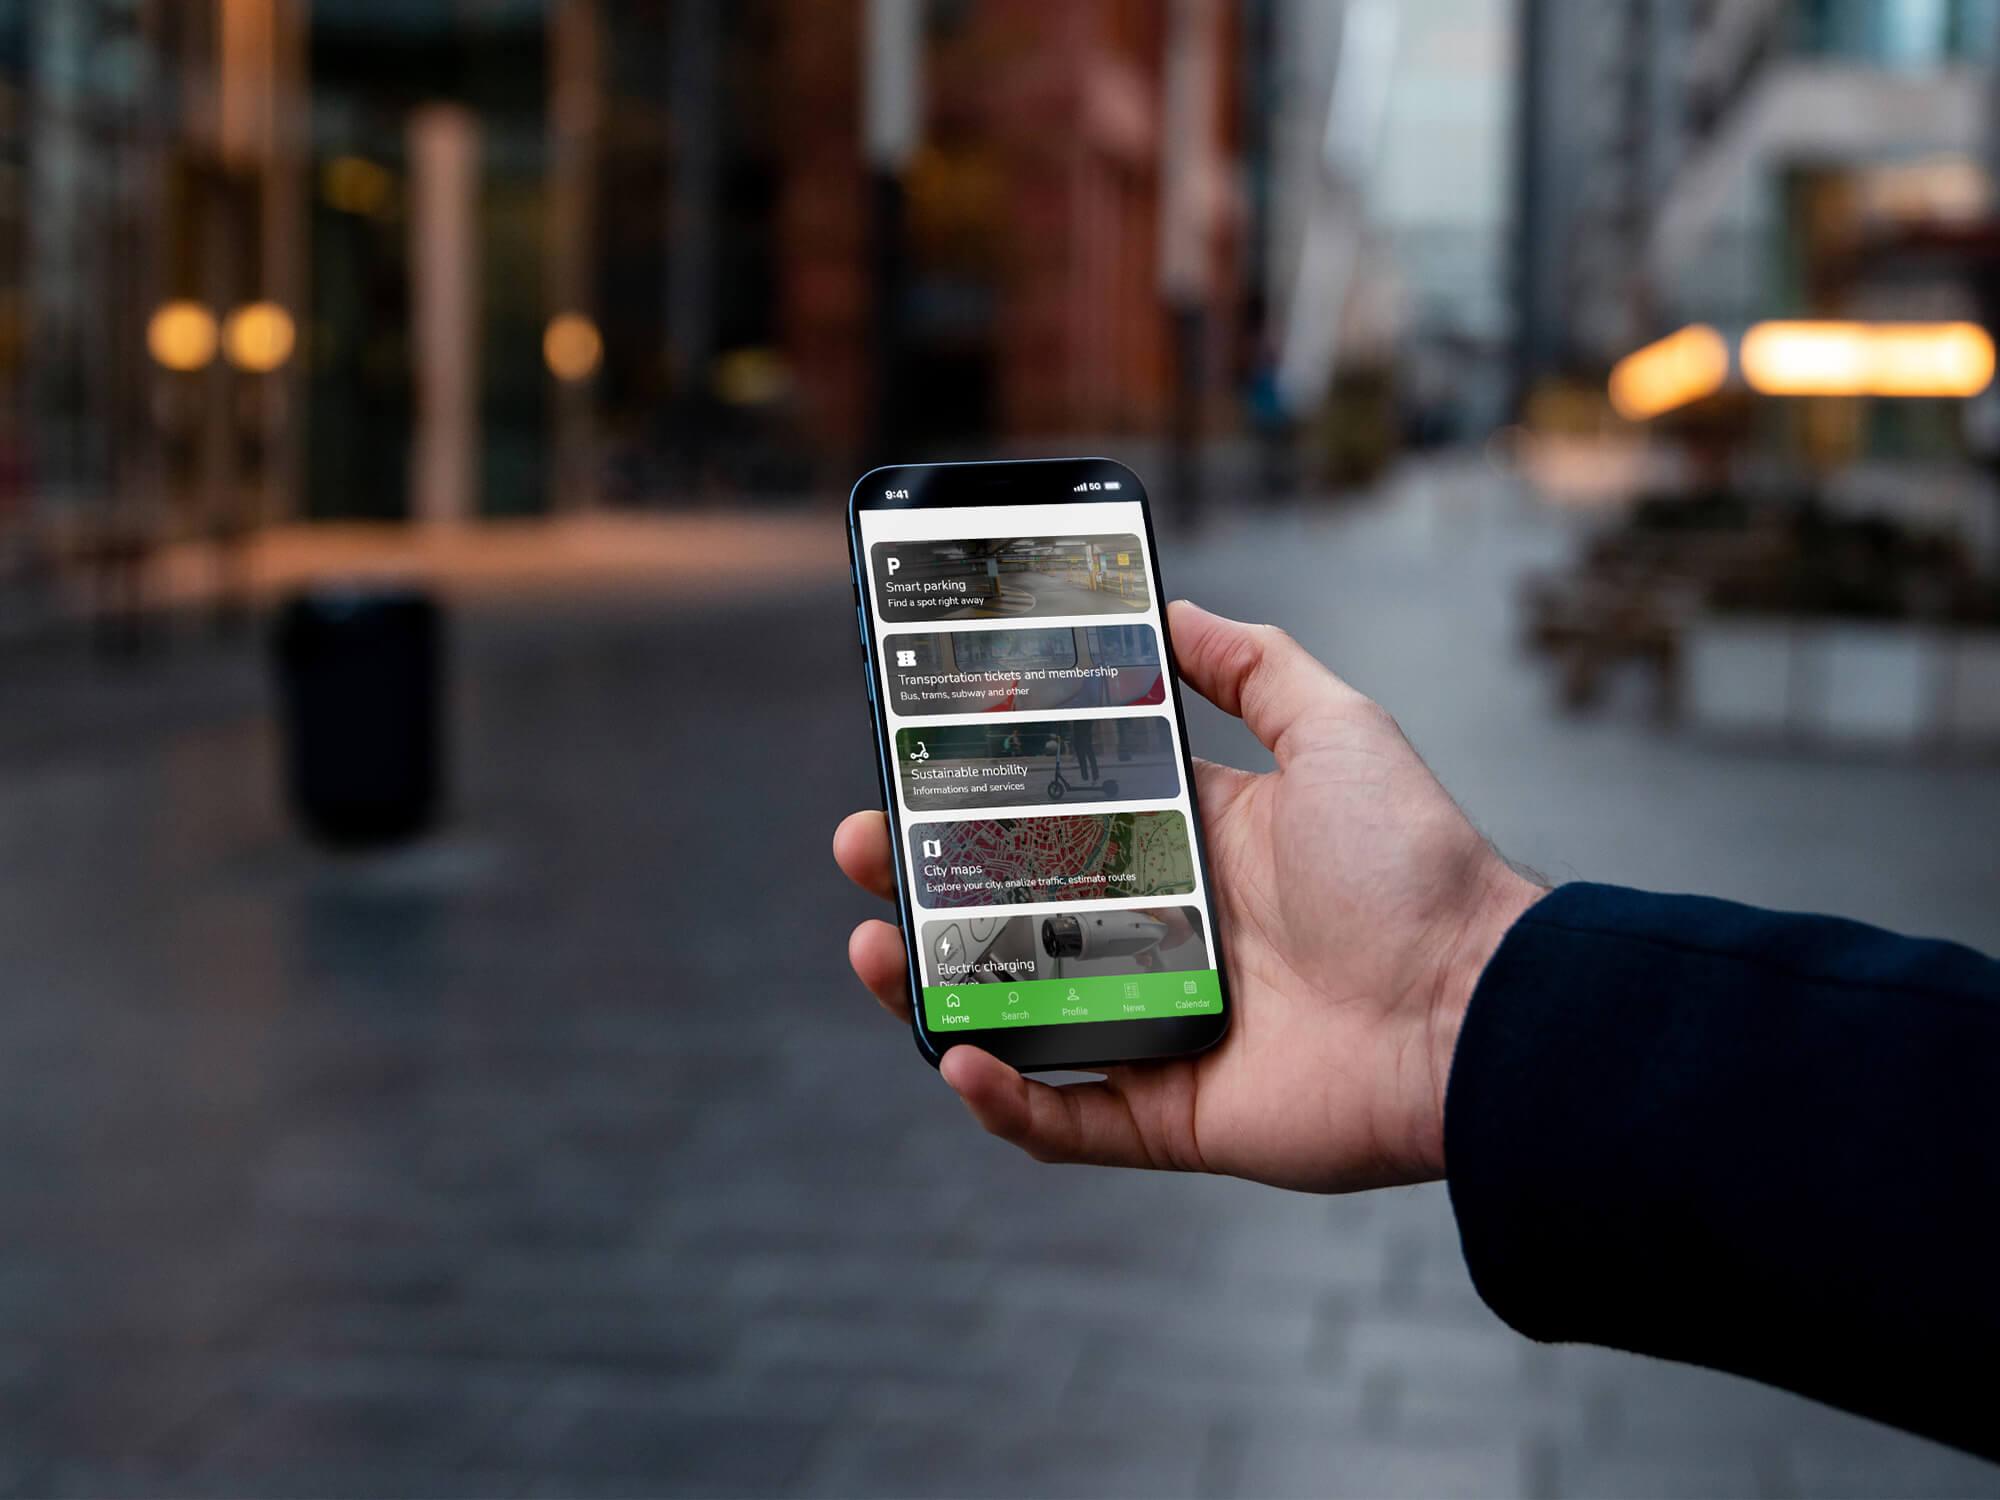 app on device